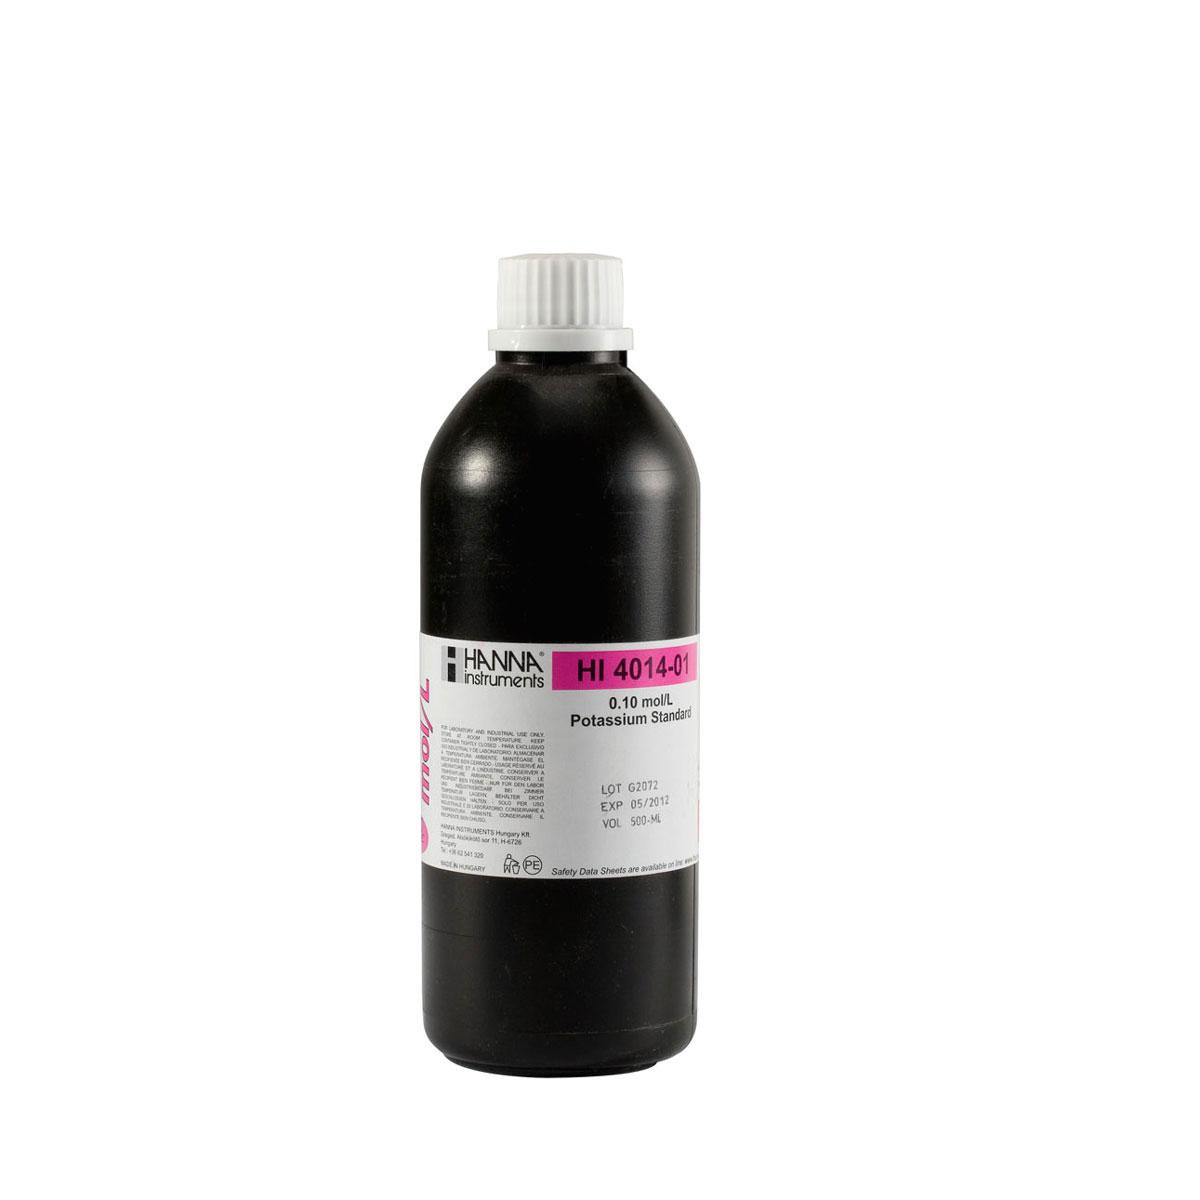 HI4014-01 Potassium Standard 0.1M (500 mL)